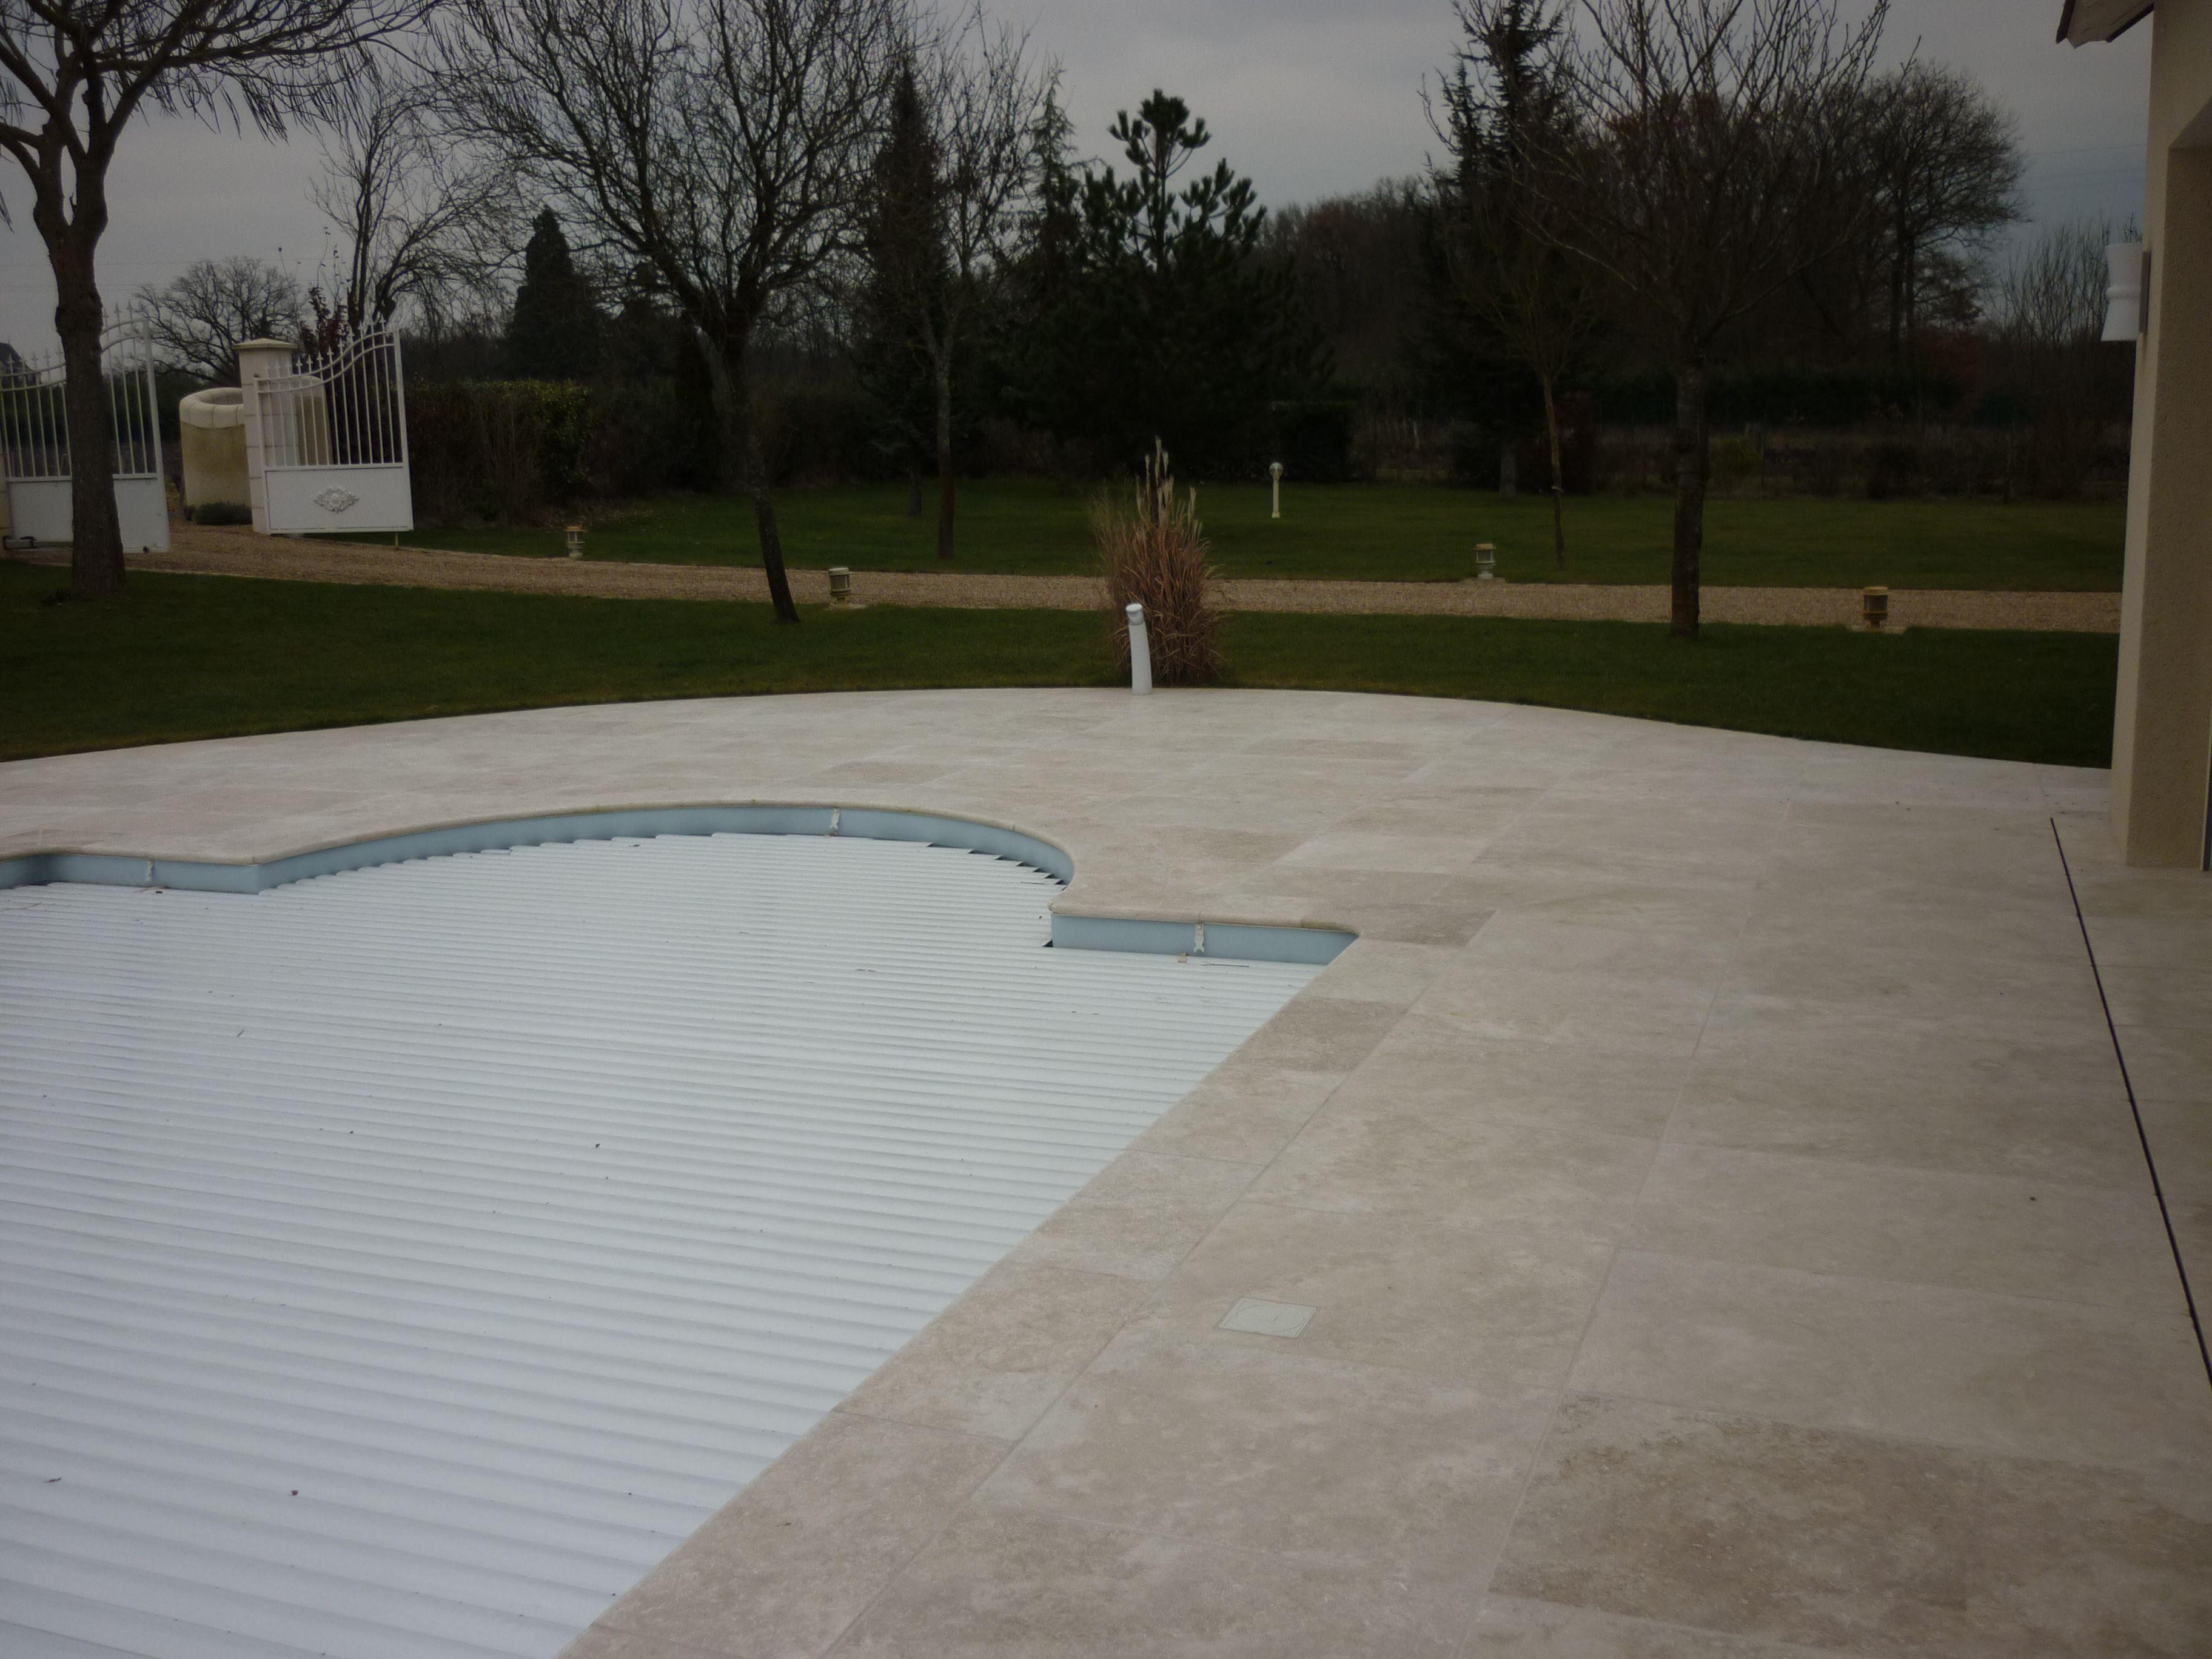 Marmol travertino avellana nuevos formatos para bordes de for Bordes decorativos para piscinas